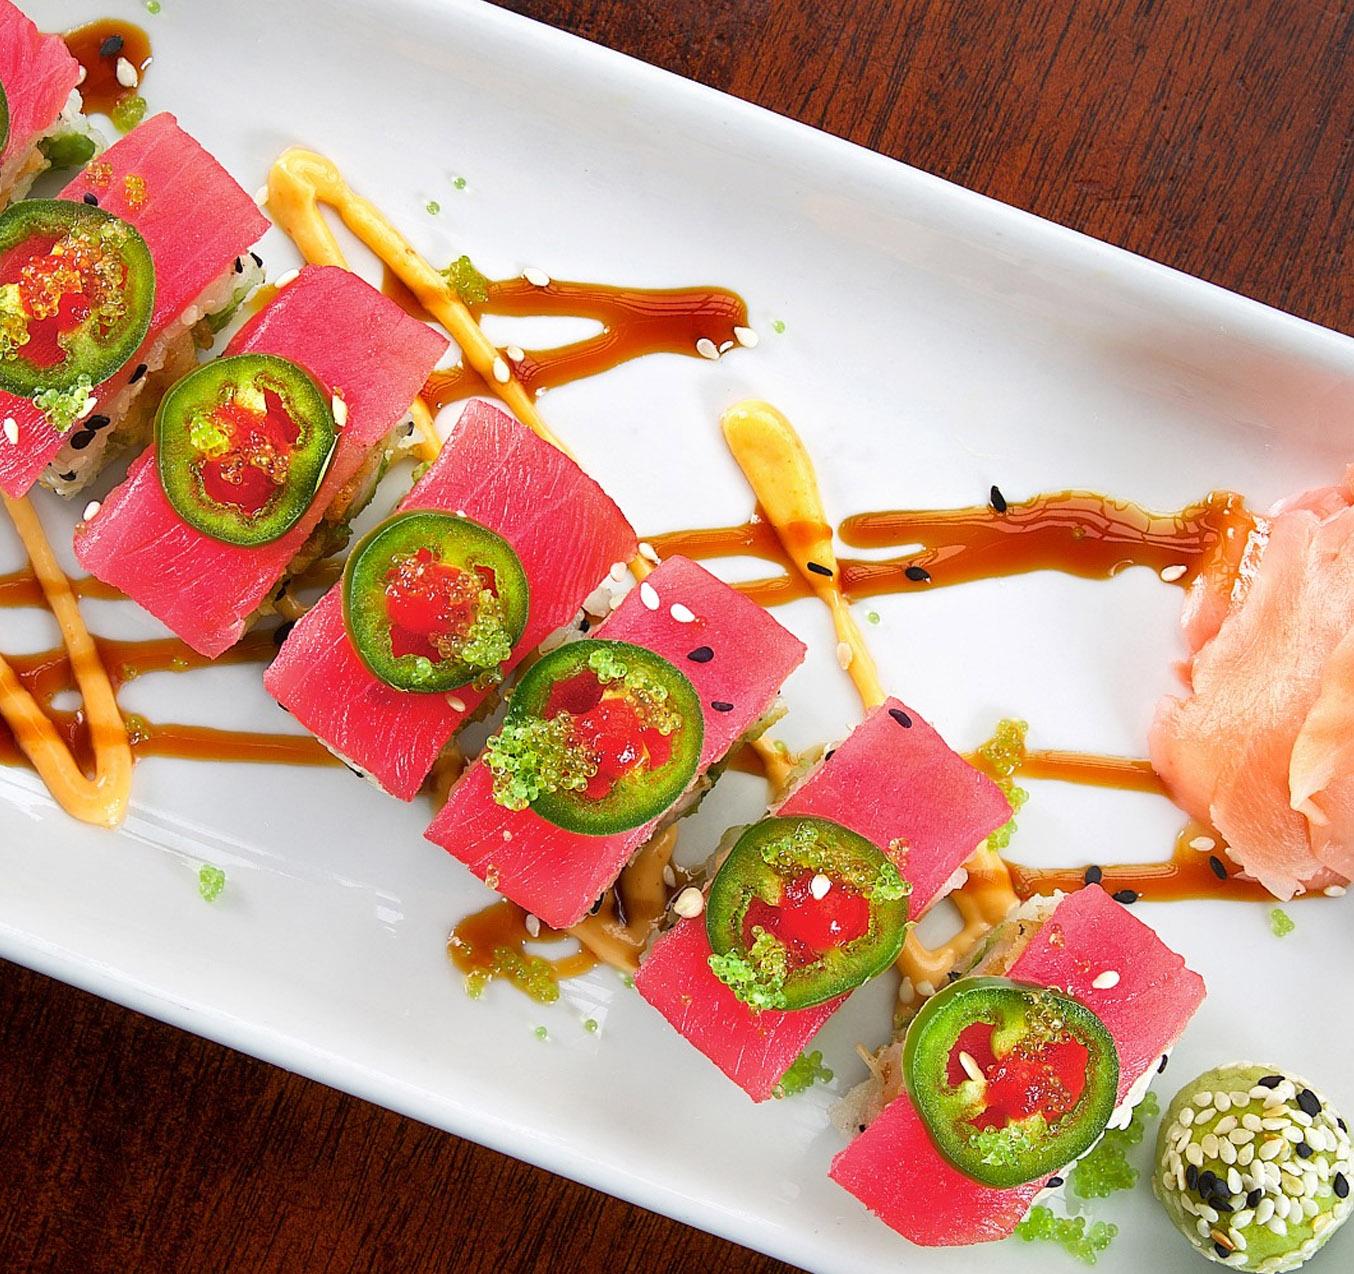 Where to Eat In Jacksonville - The Black Sheep Restaurant